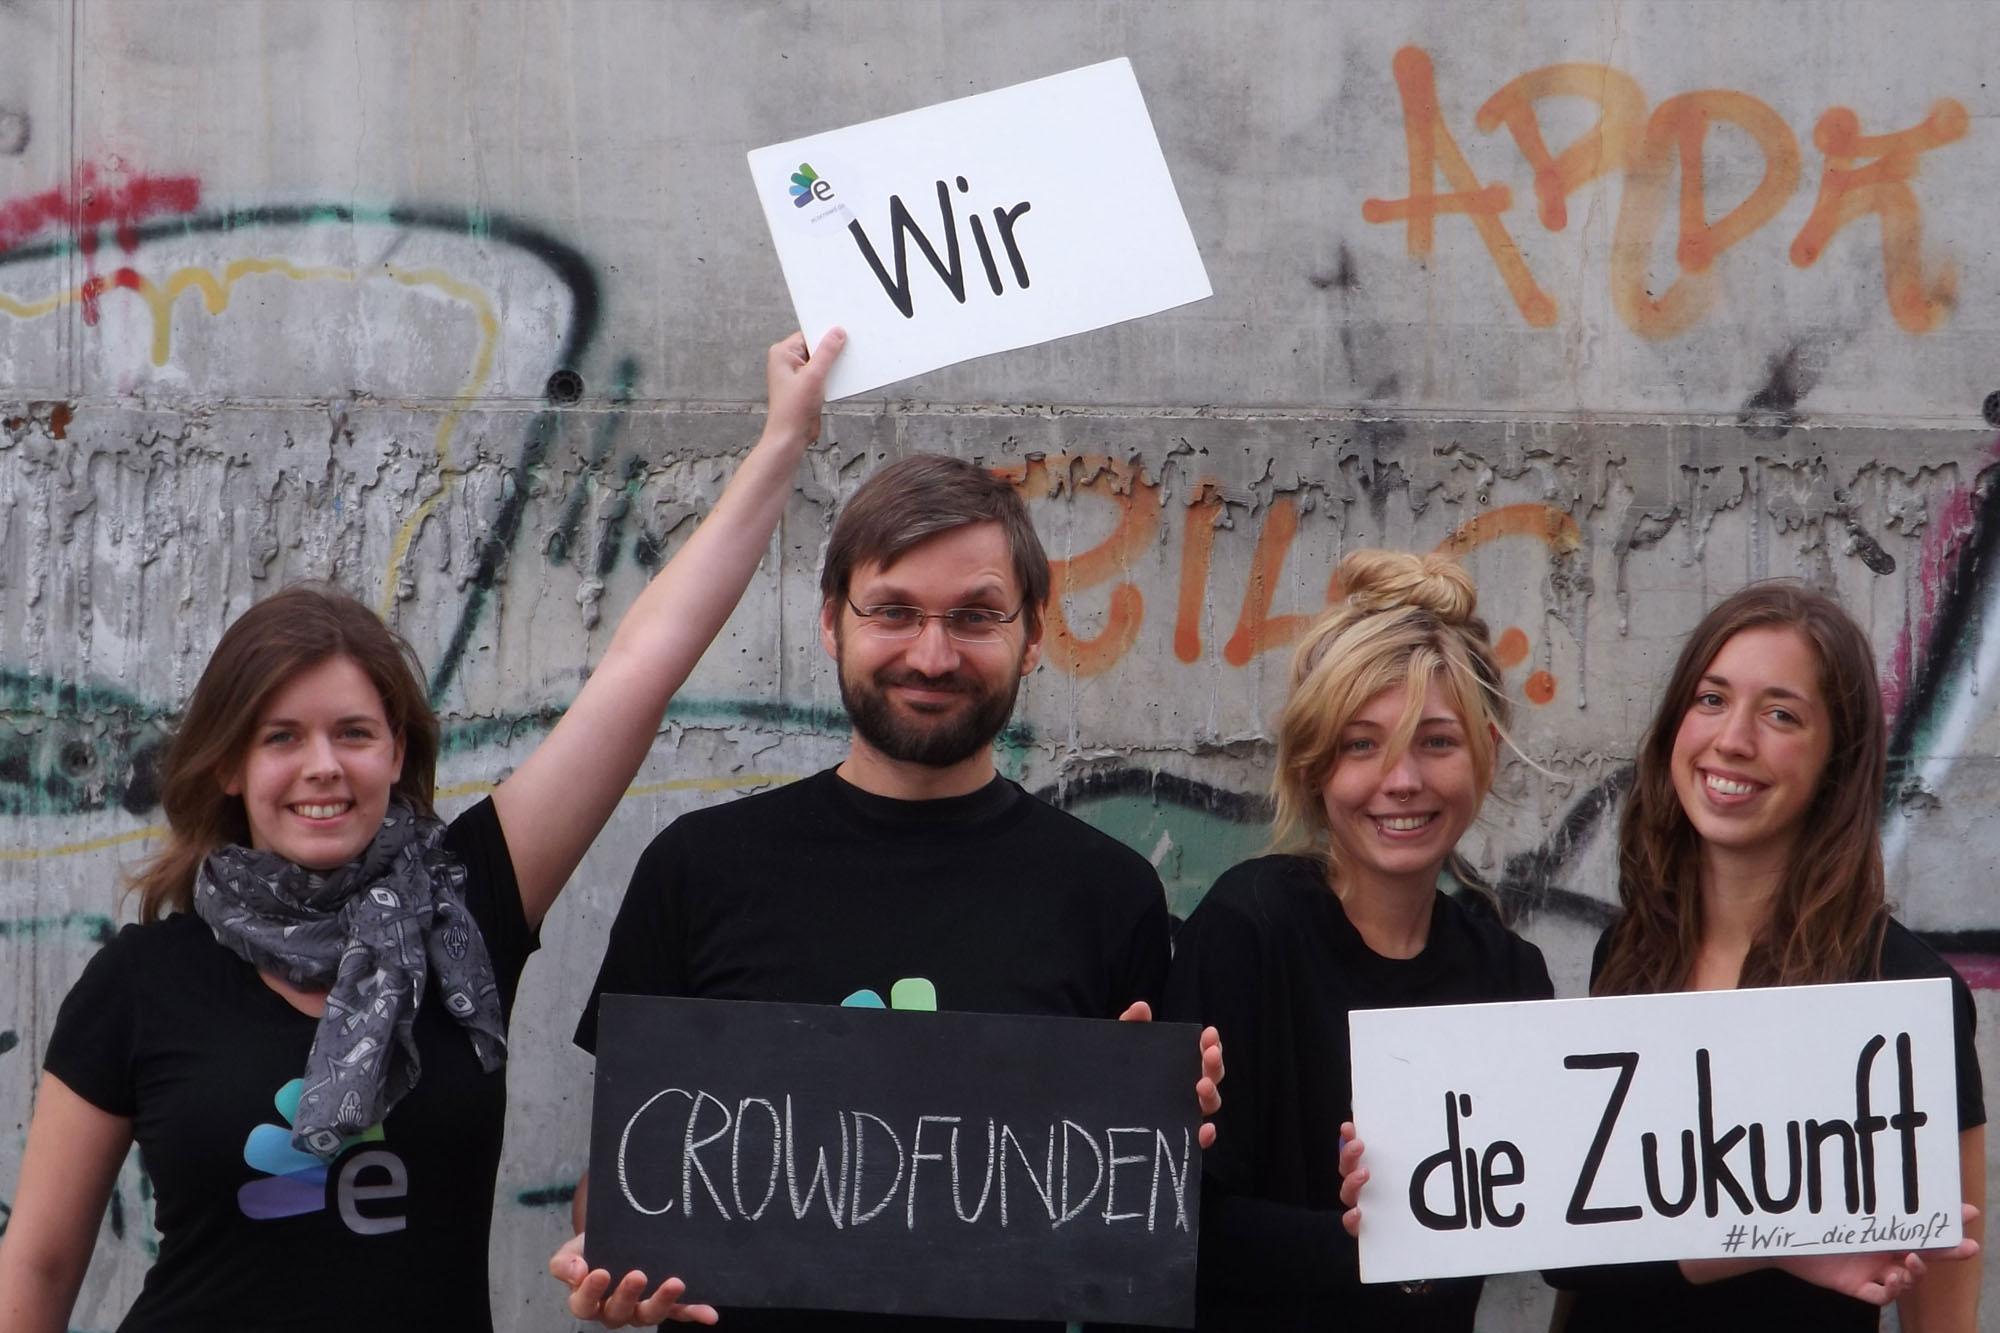 ecocrowd nachhaltiges crowdfunding